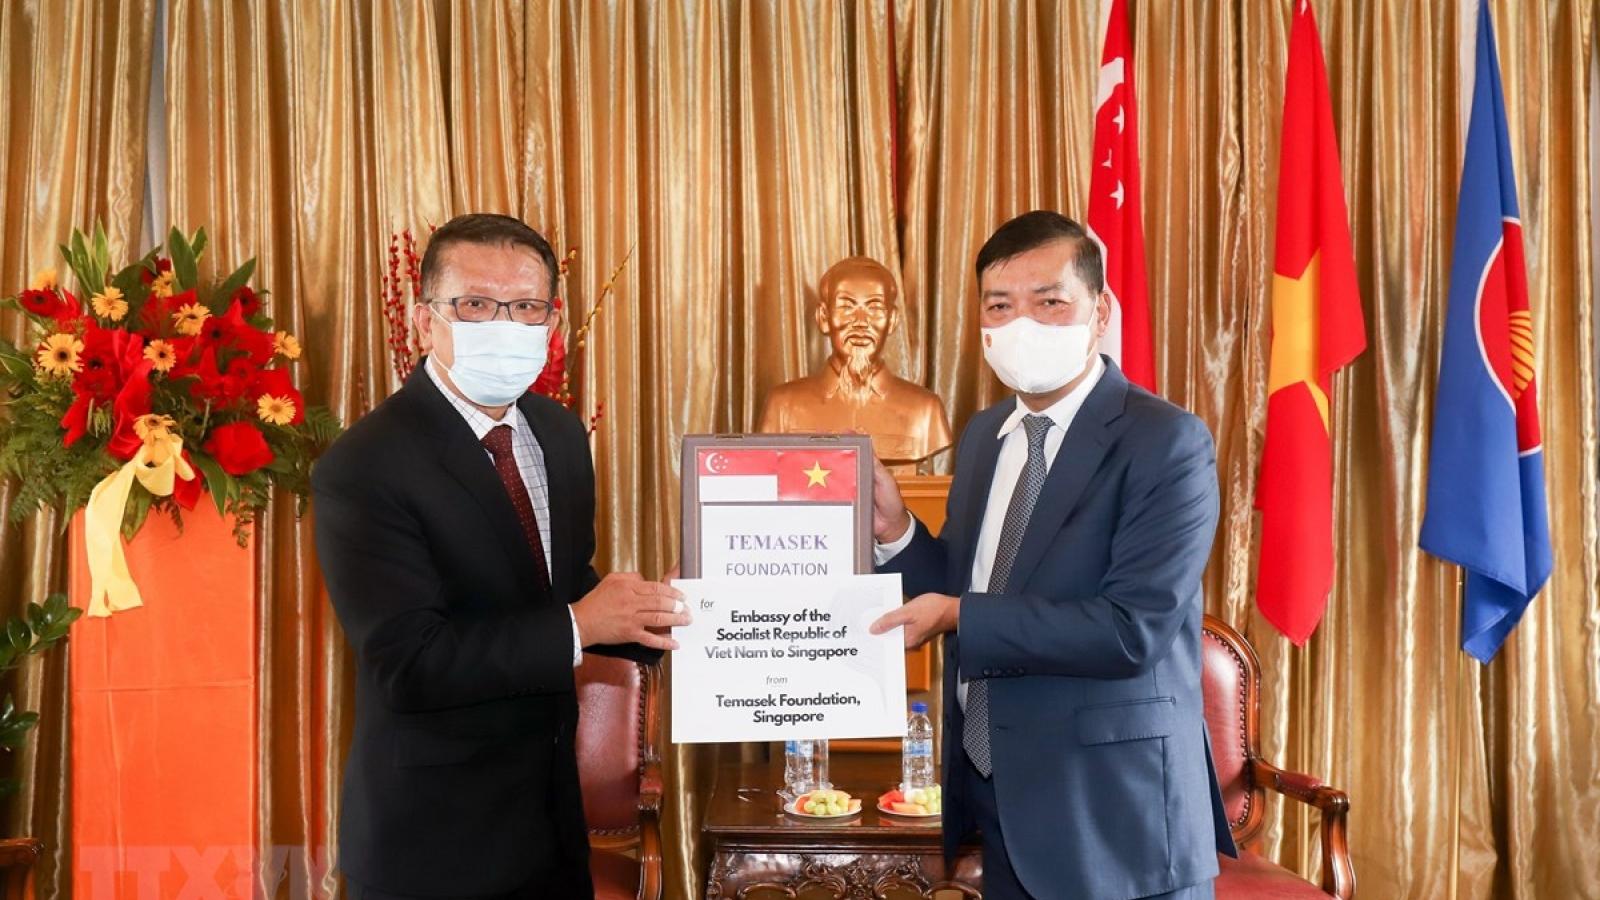 Singapore's Temasek presents COVID-19 medical supplies to Vietnam